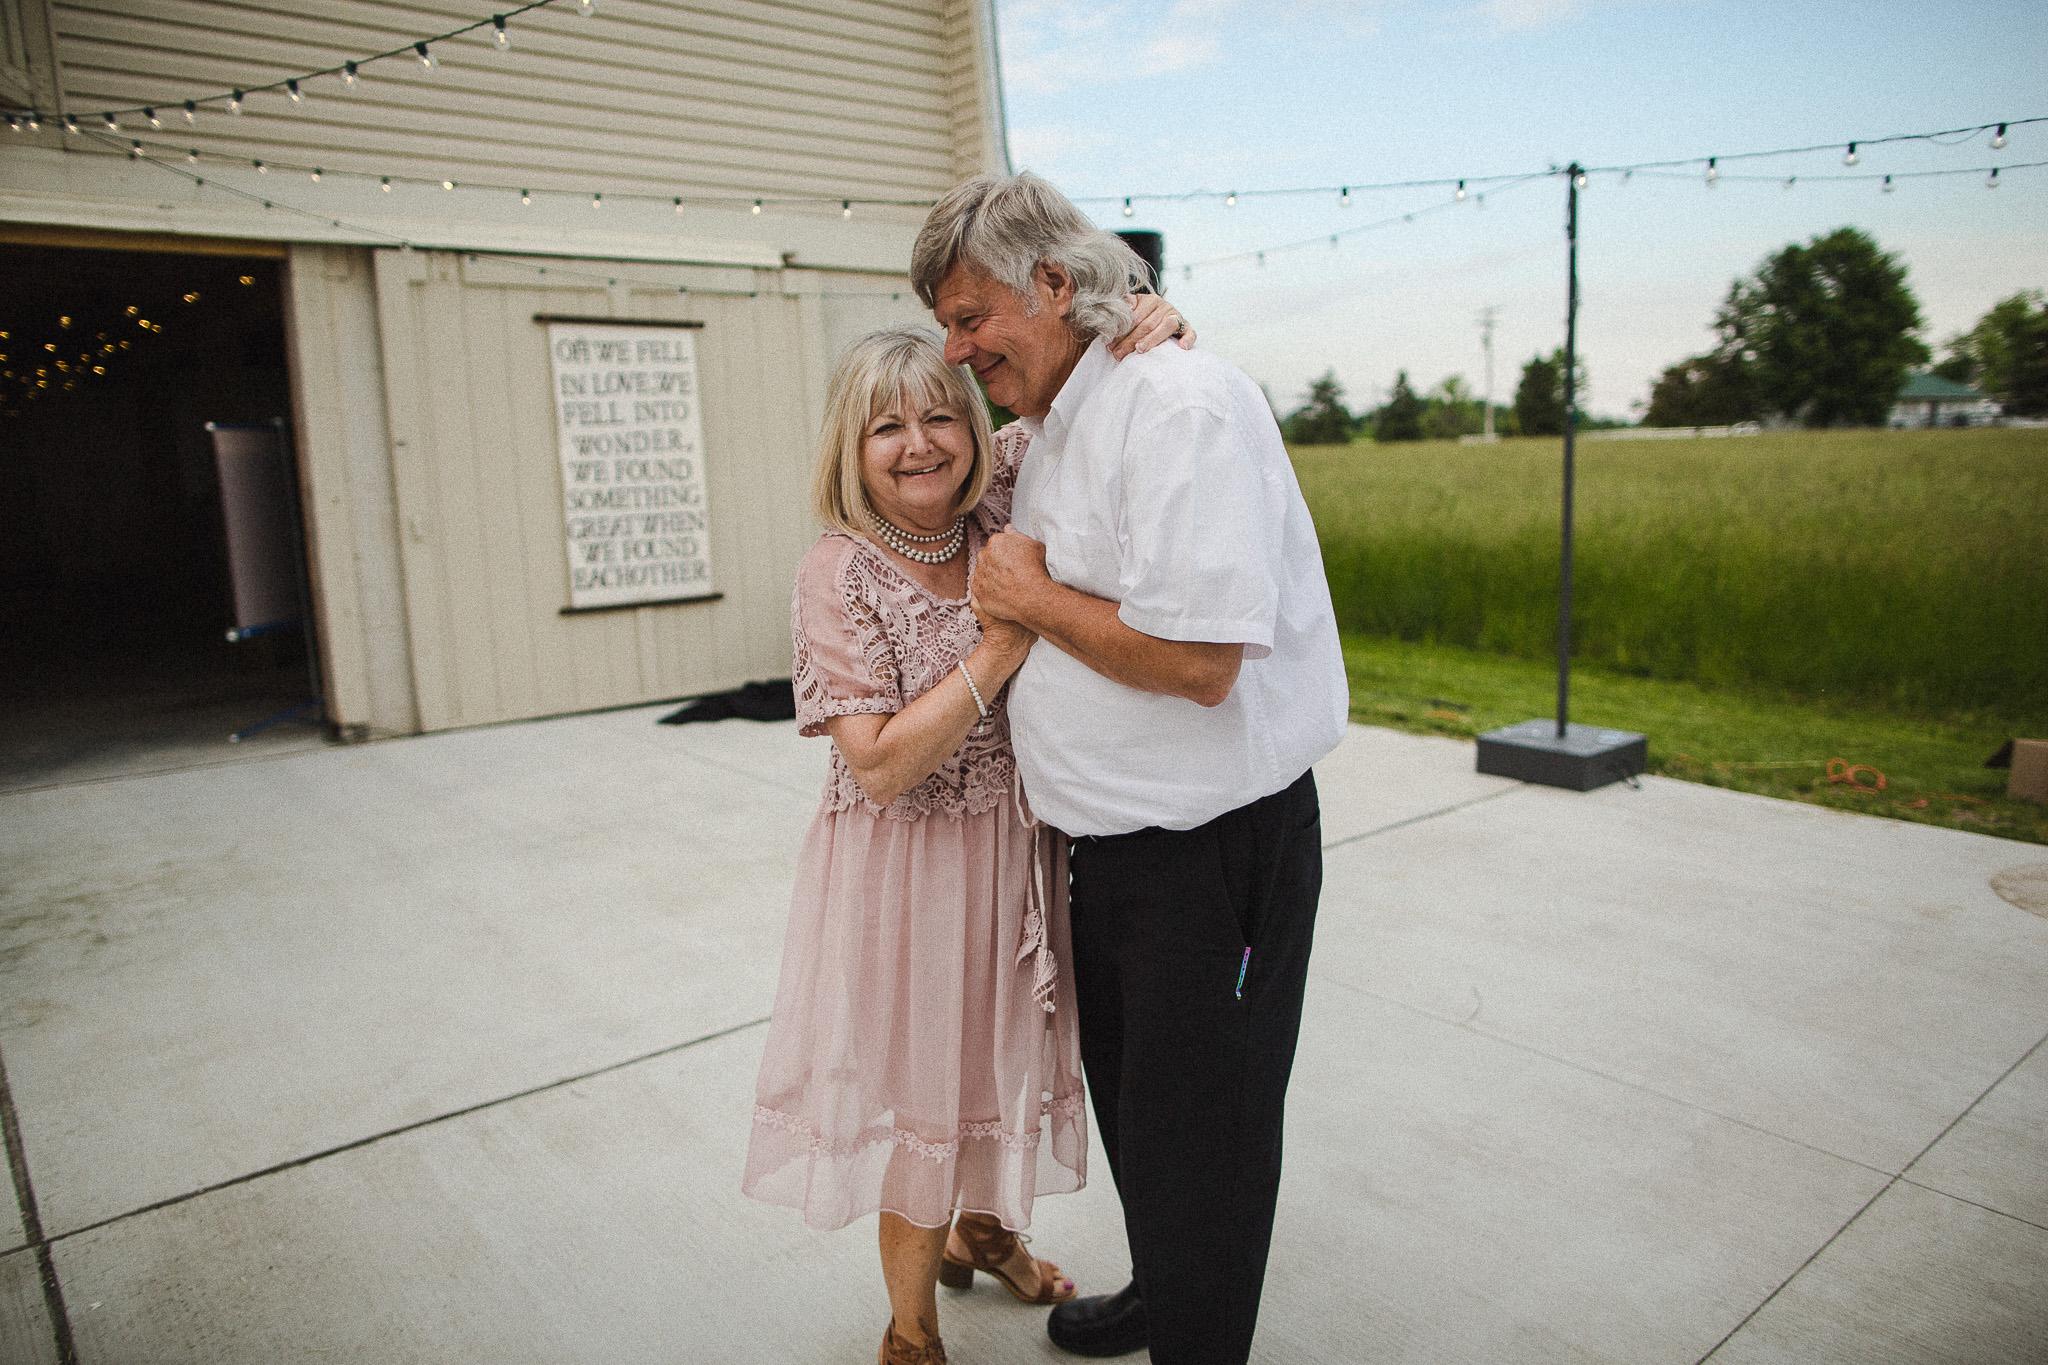 Orlando-Wedding-Photographer (72 of 89).JPG